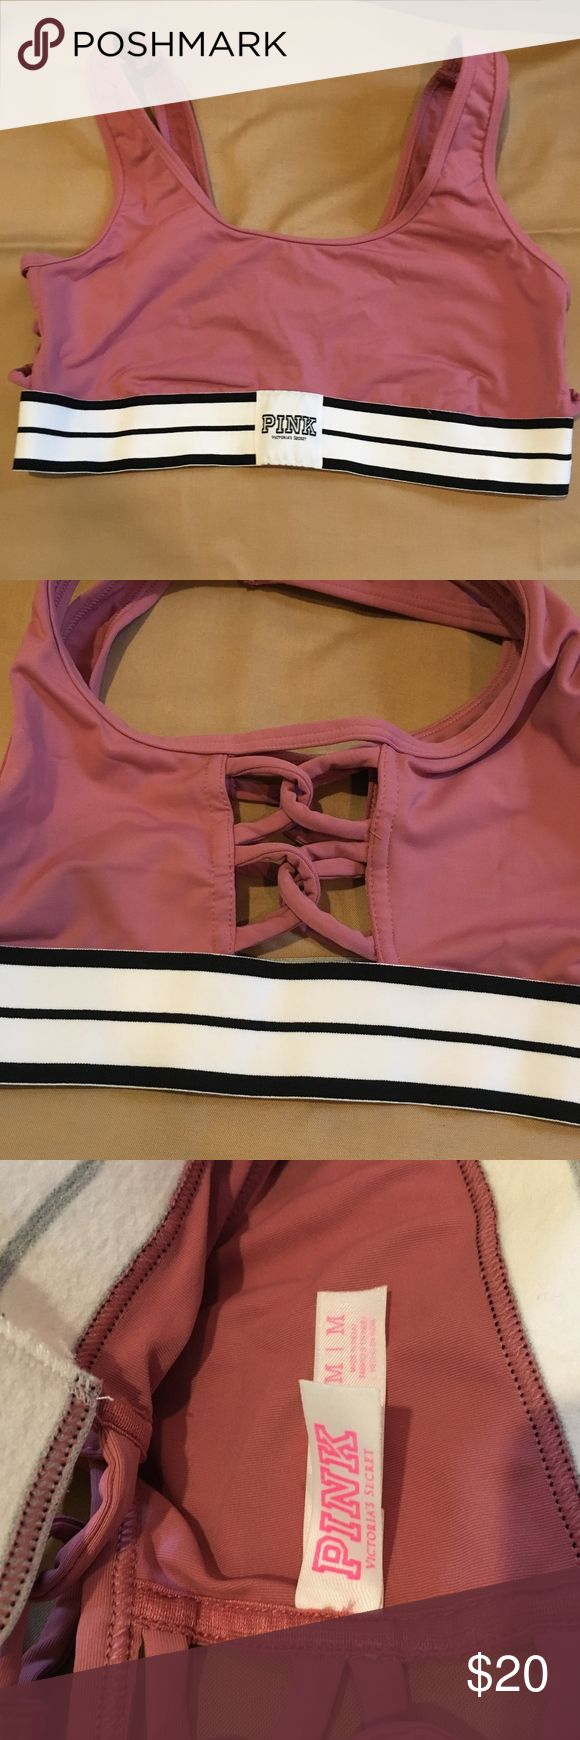 Victoria Secret PINK Sports Bra Cute VS PINK sports bra, NWOT, Size Medium. PINK Victoria's Secret Intimates & Sleepwear Bras